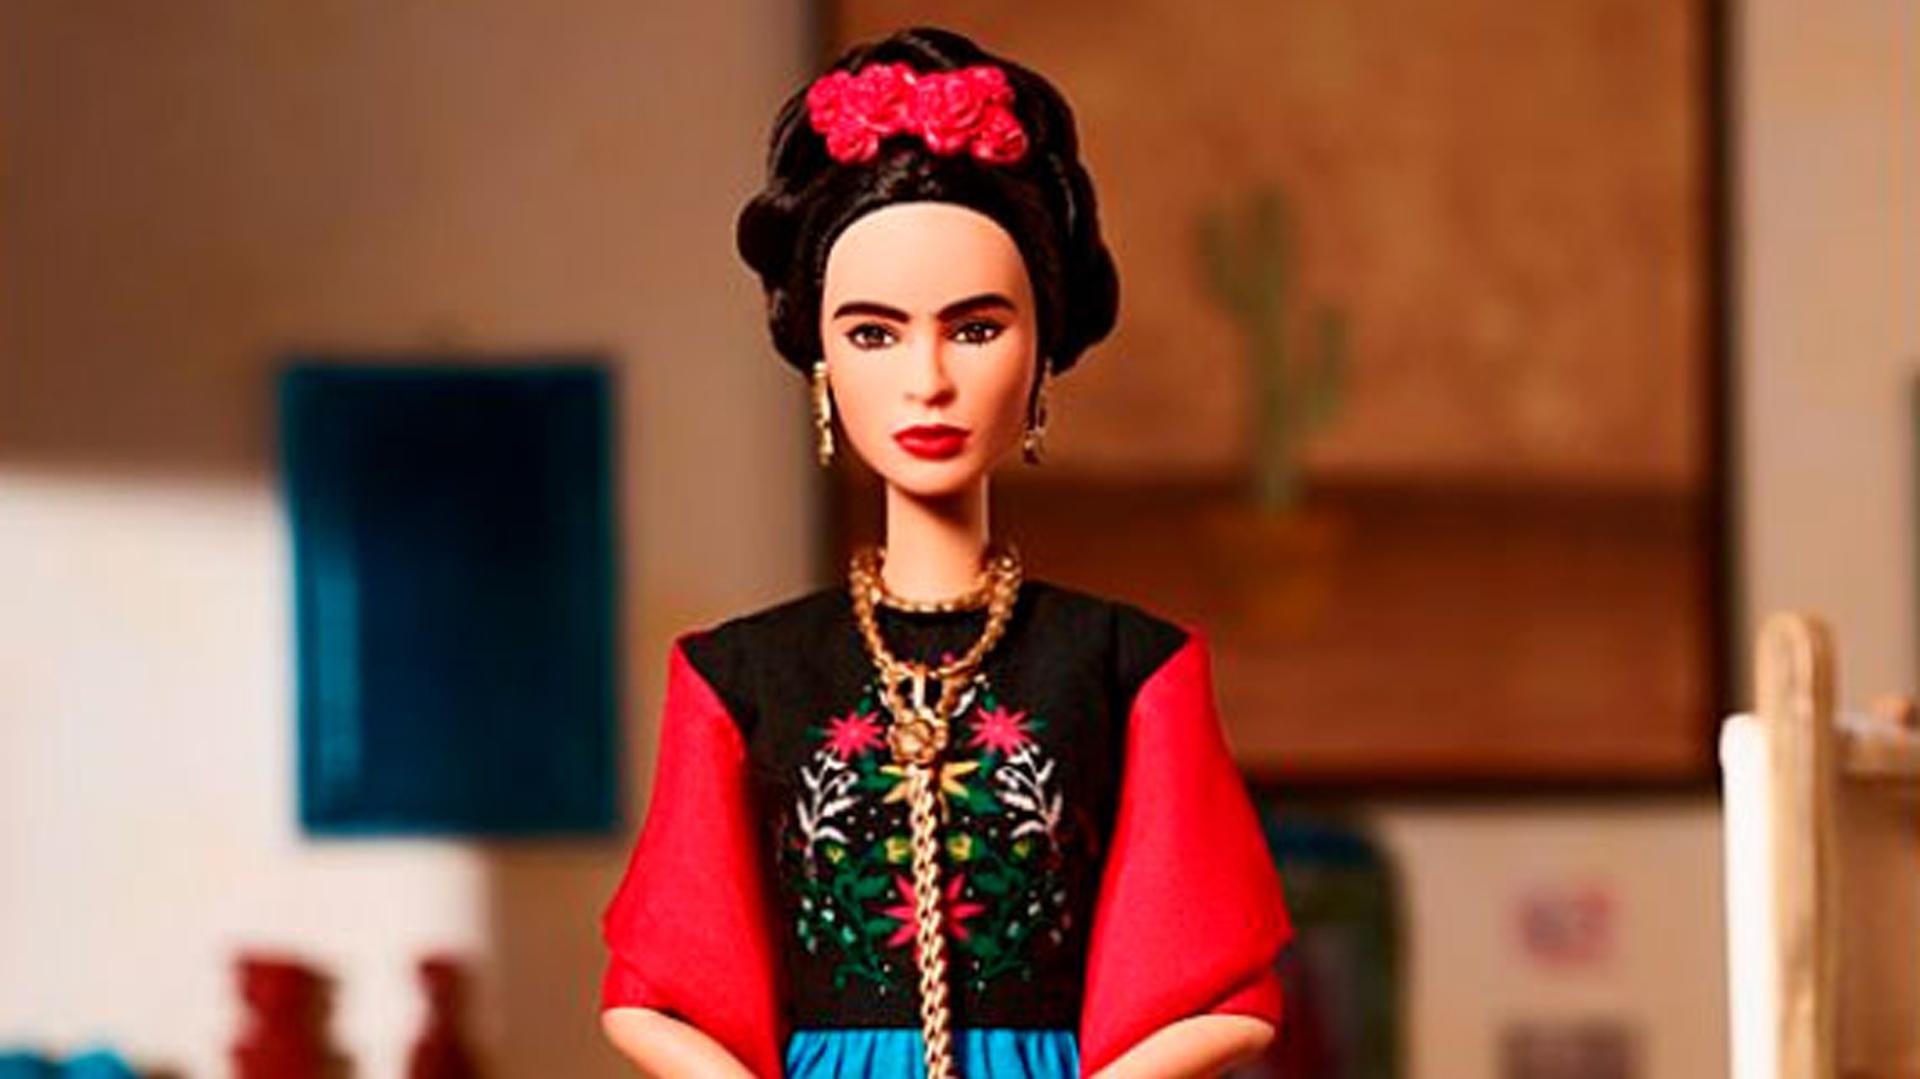 Frida Kalho de Mattel